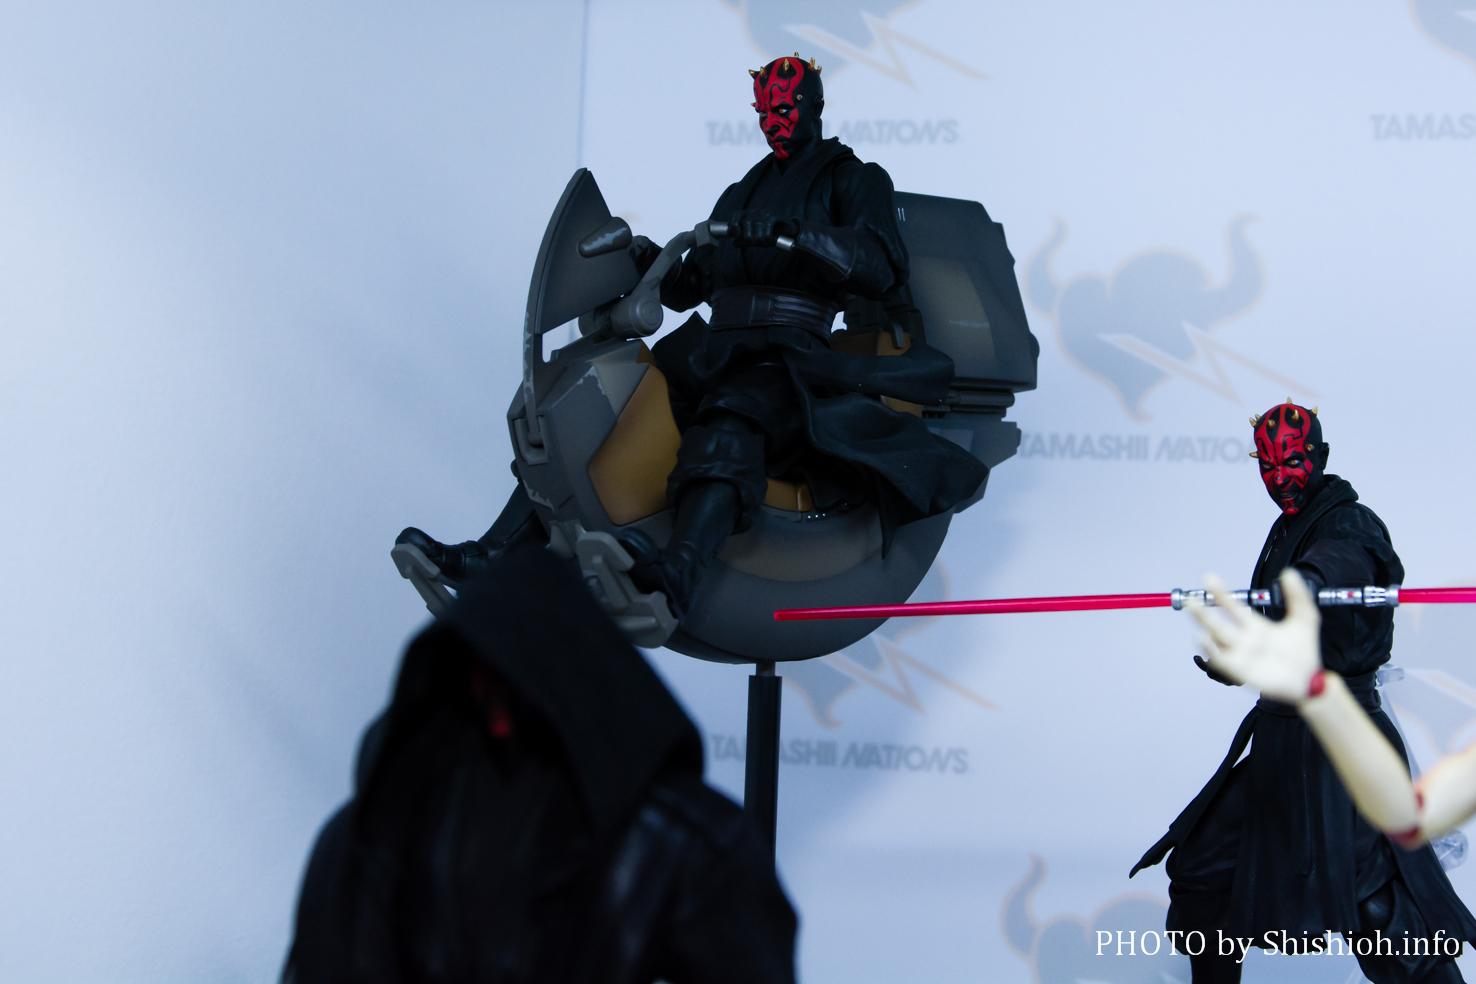 TAMASHII Comic-Con タマシイ コミ魂(コン) 内覧会